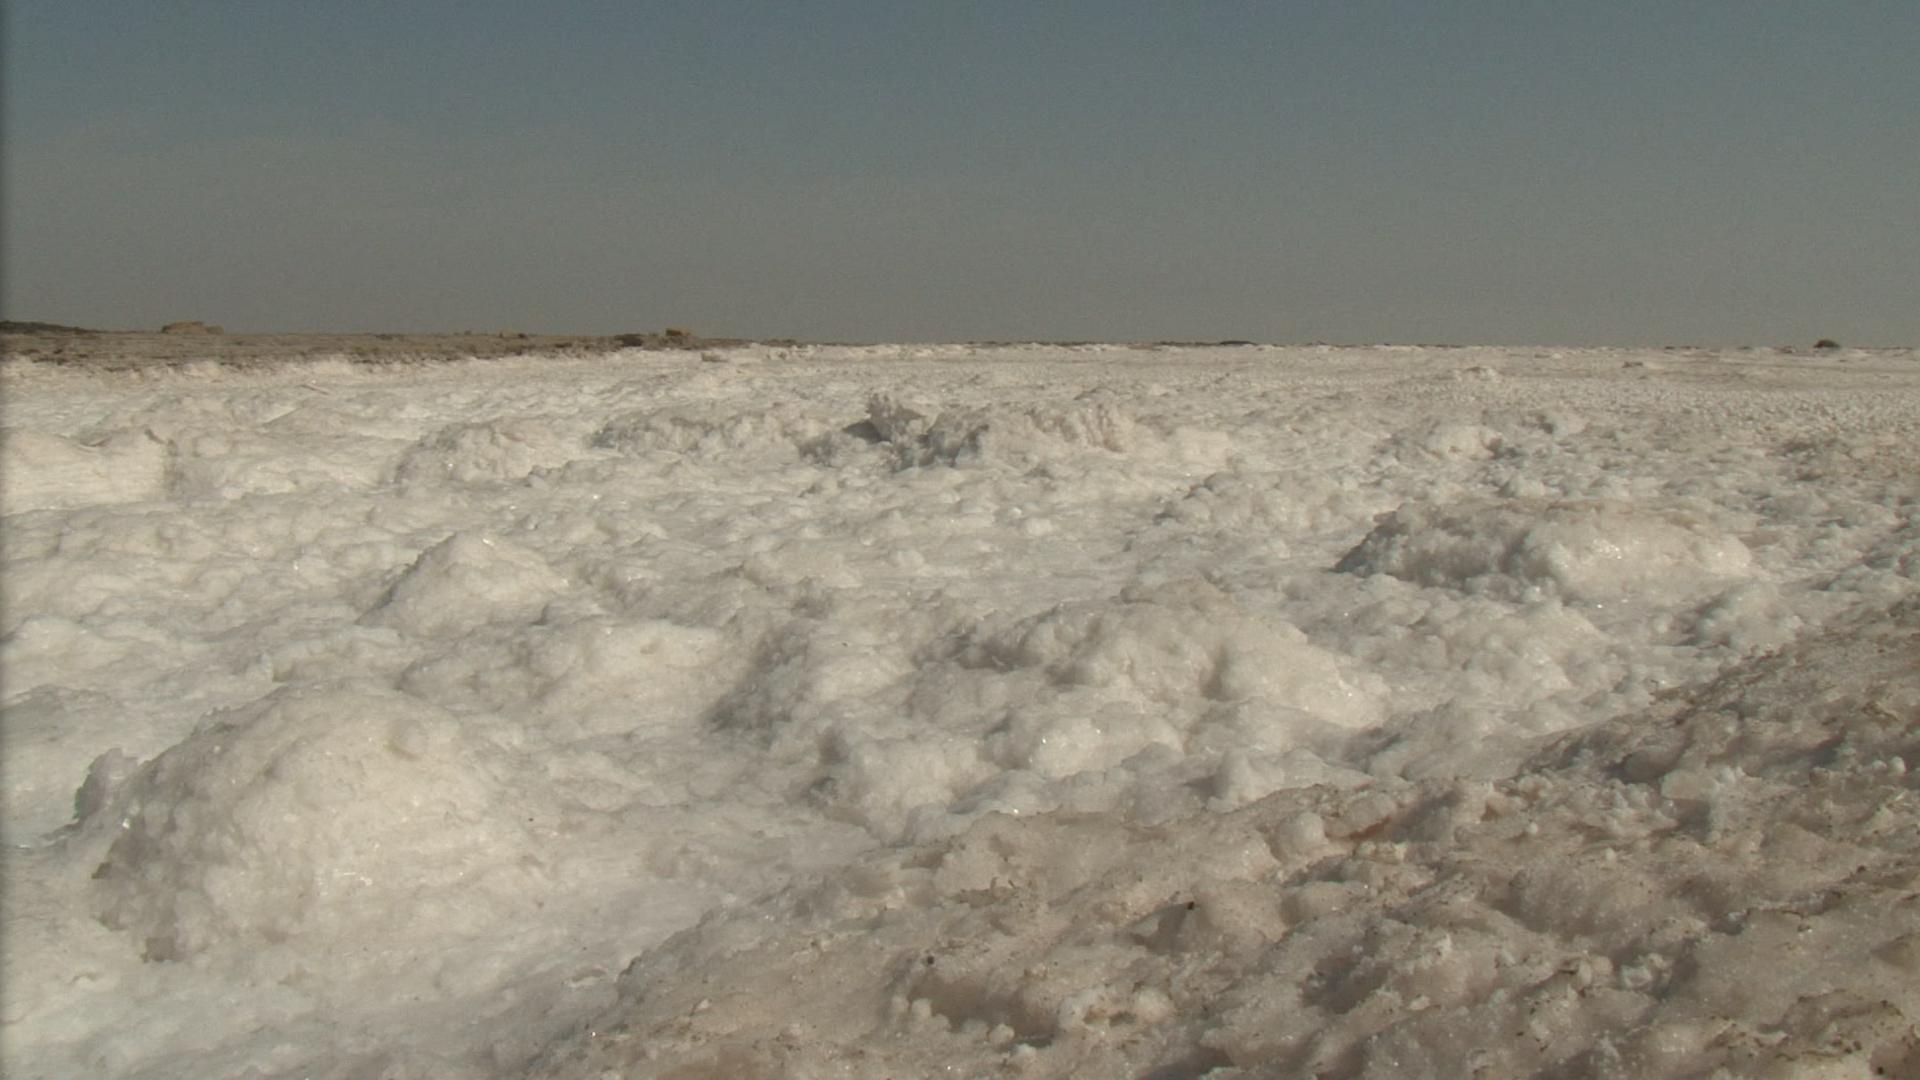 Salt desert — the Rann of Kachchh. Credit: KP Jayasankar